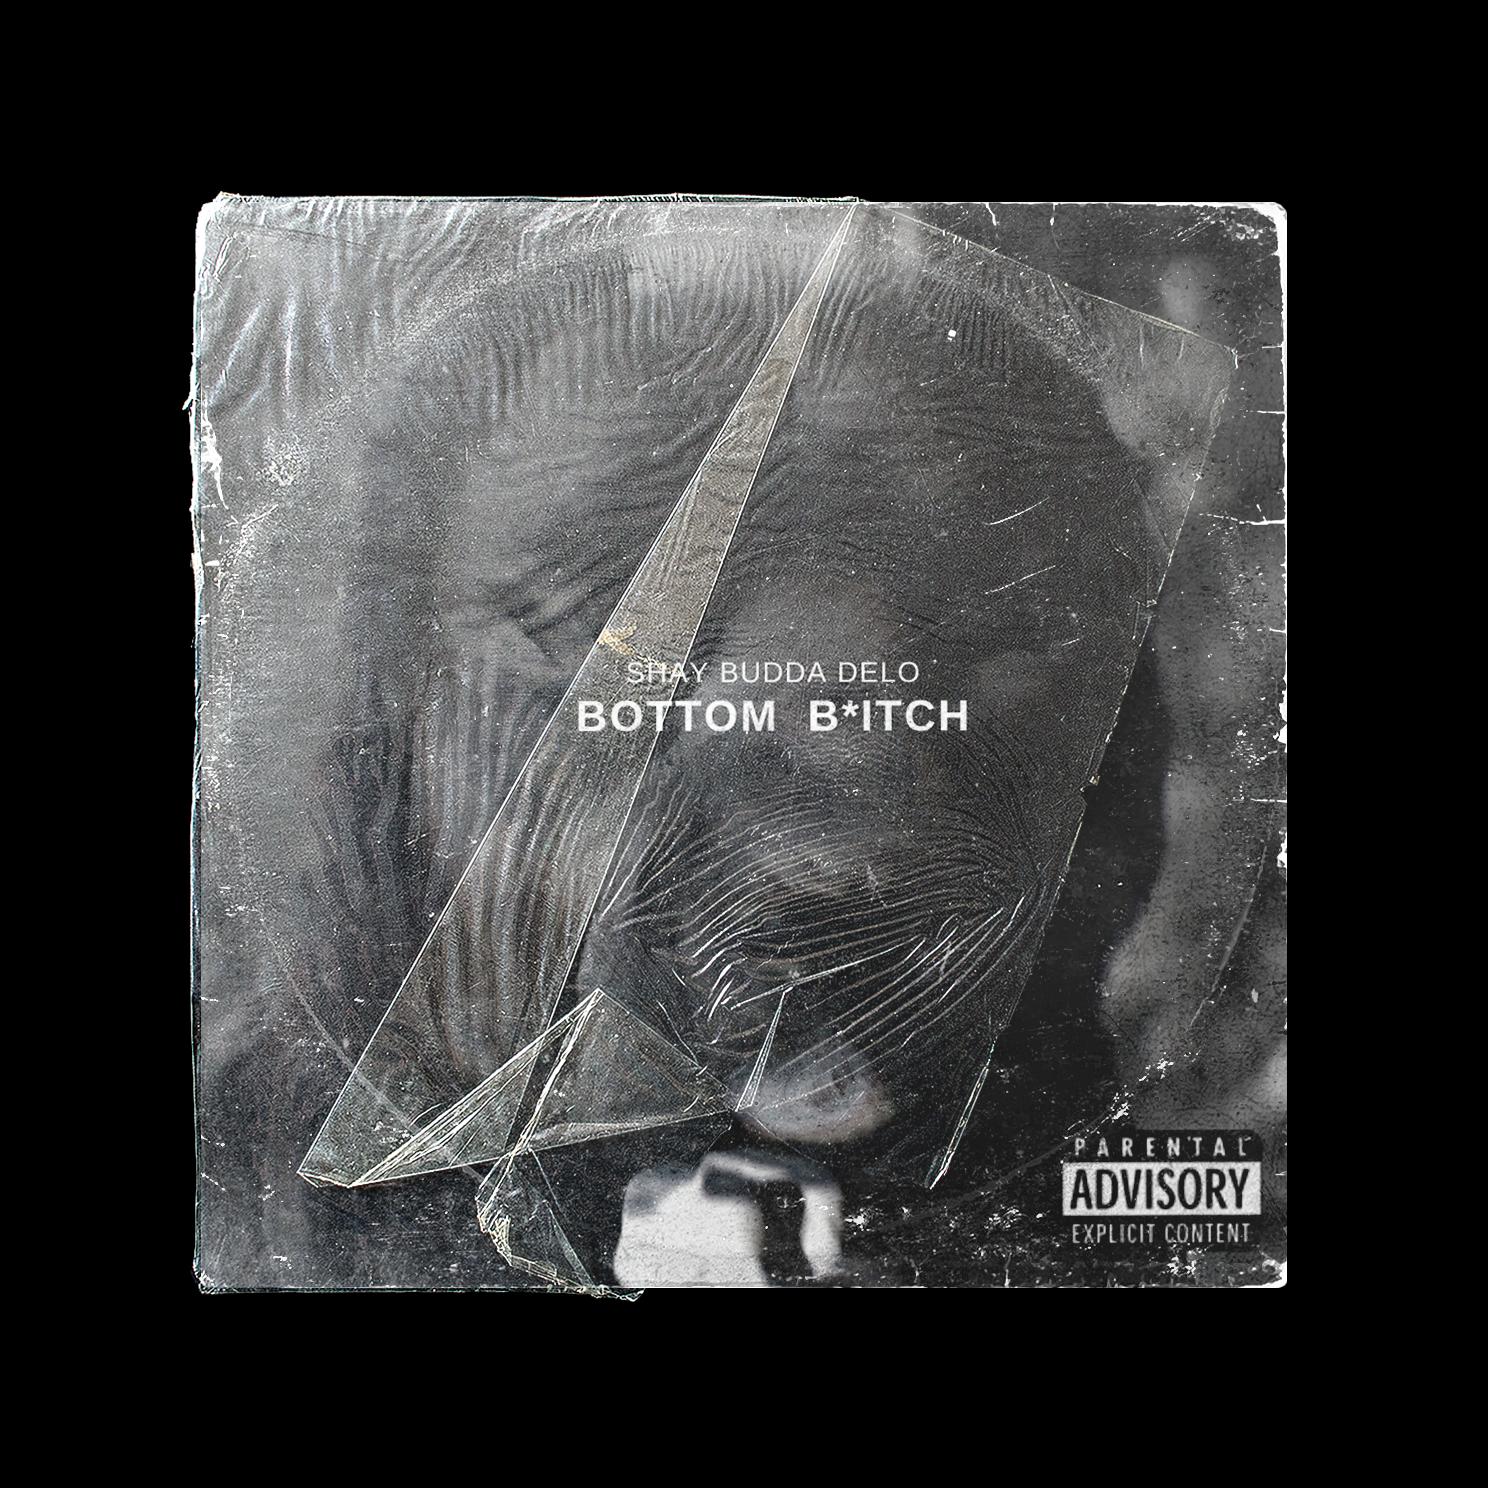 Bottom Bitch - Deloney